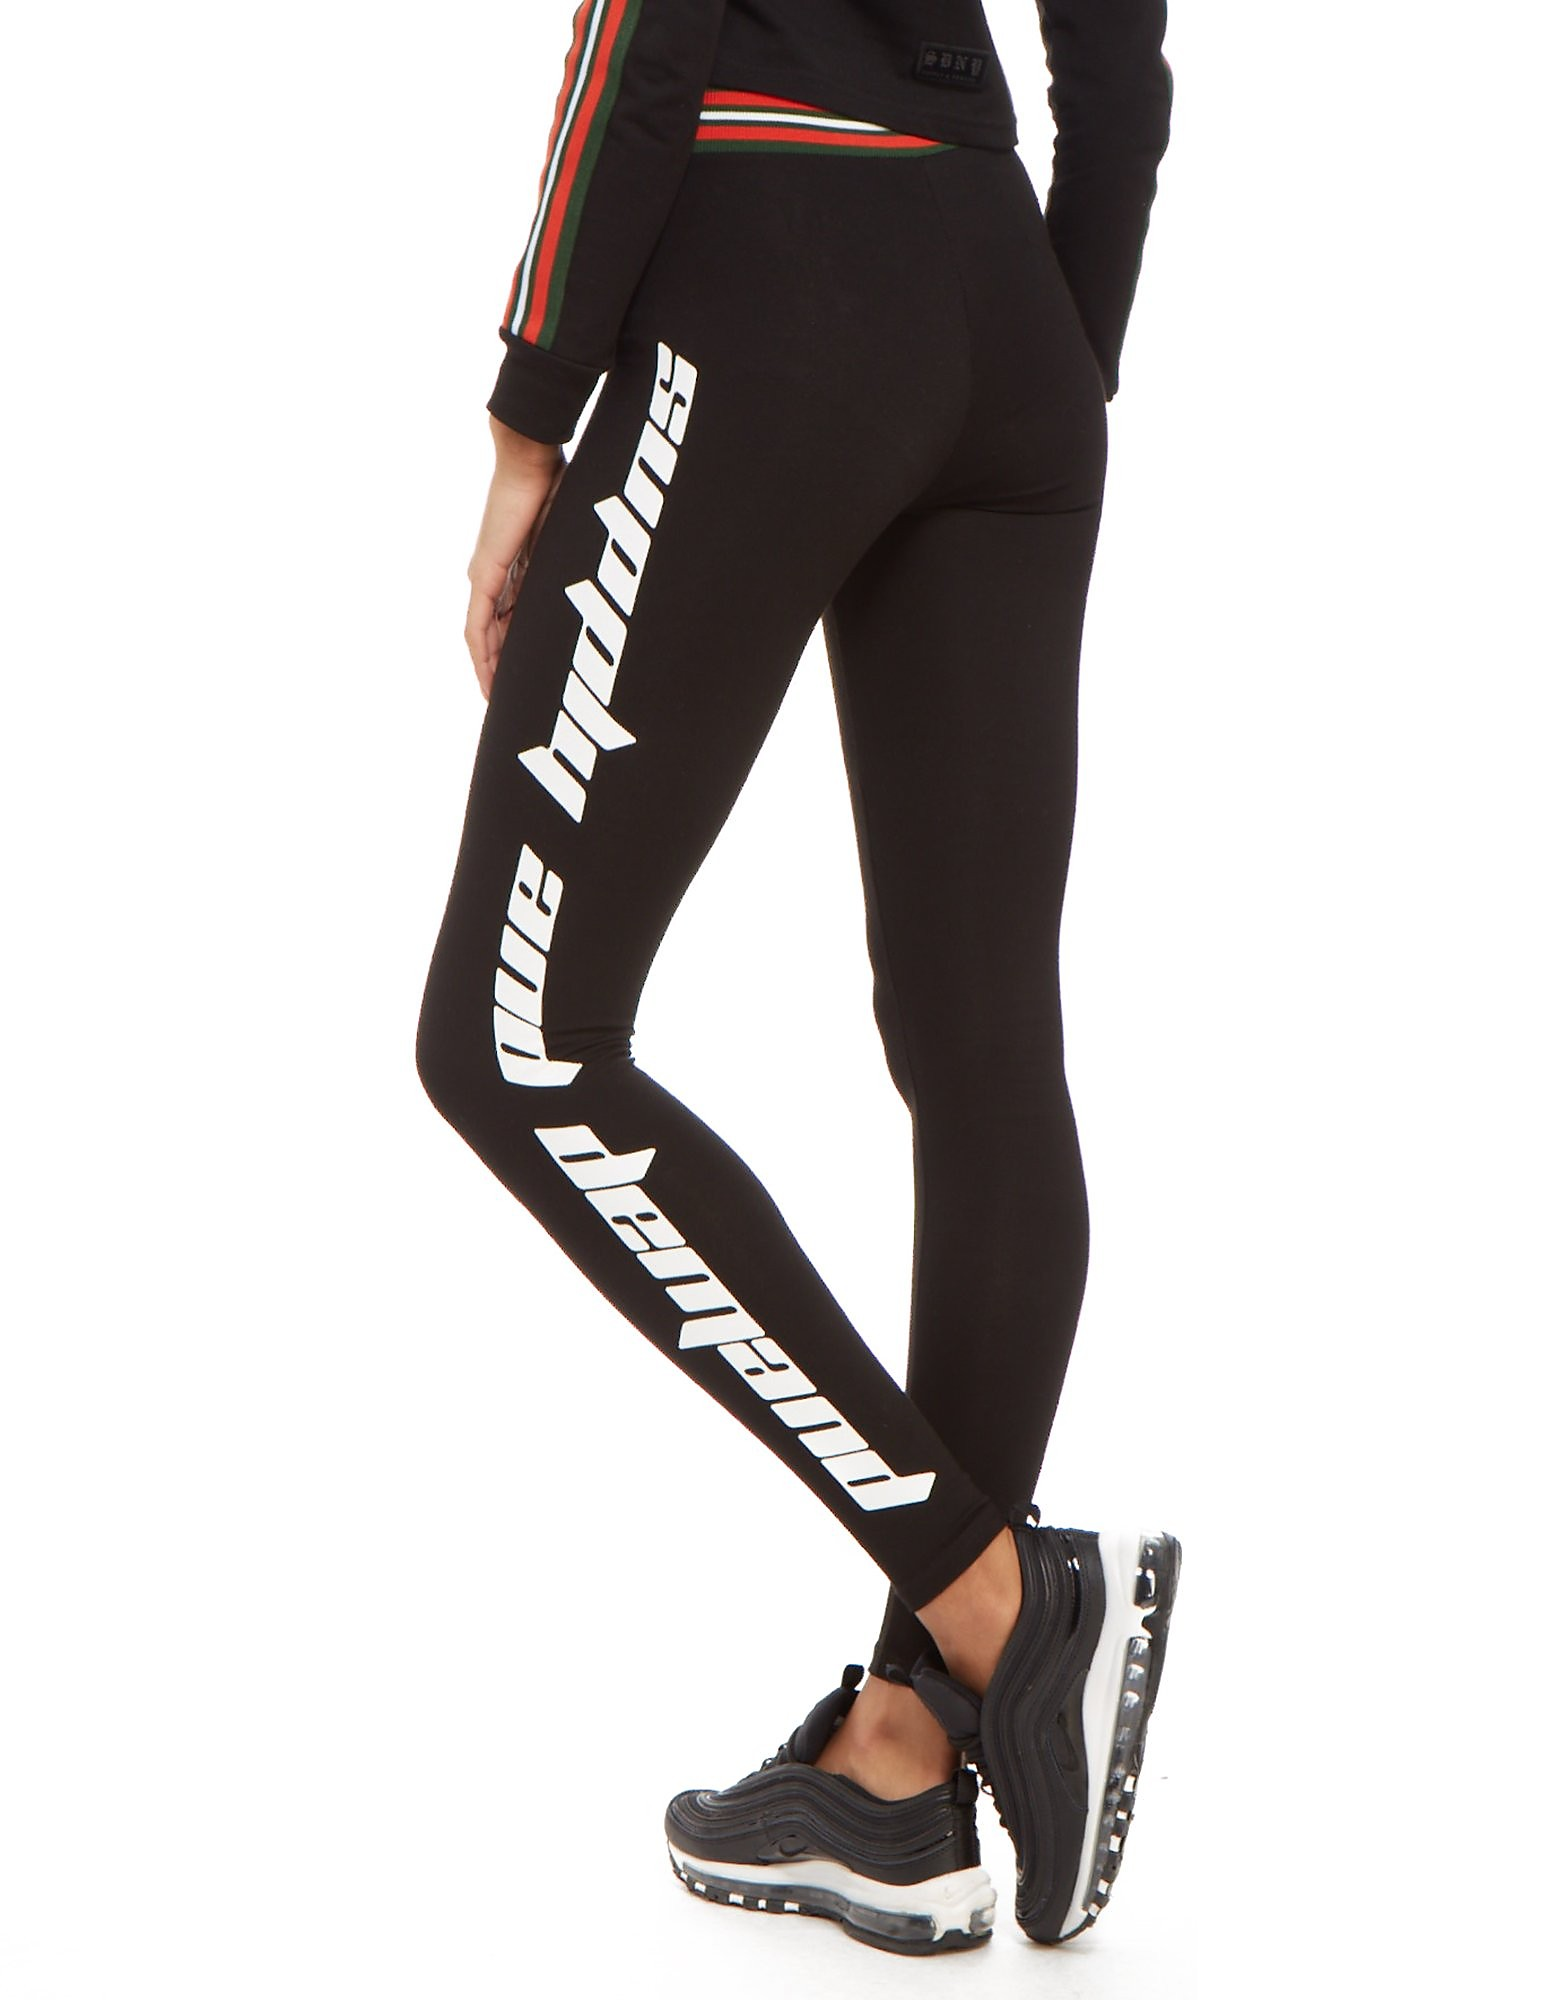 Supply & Demand Tape leggings